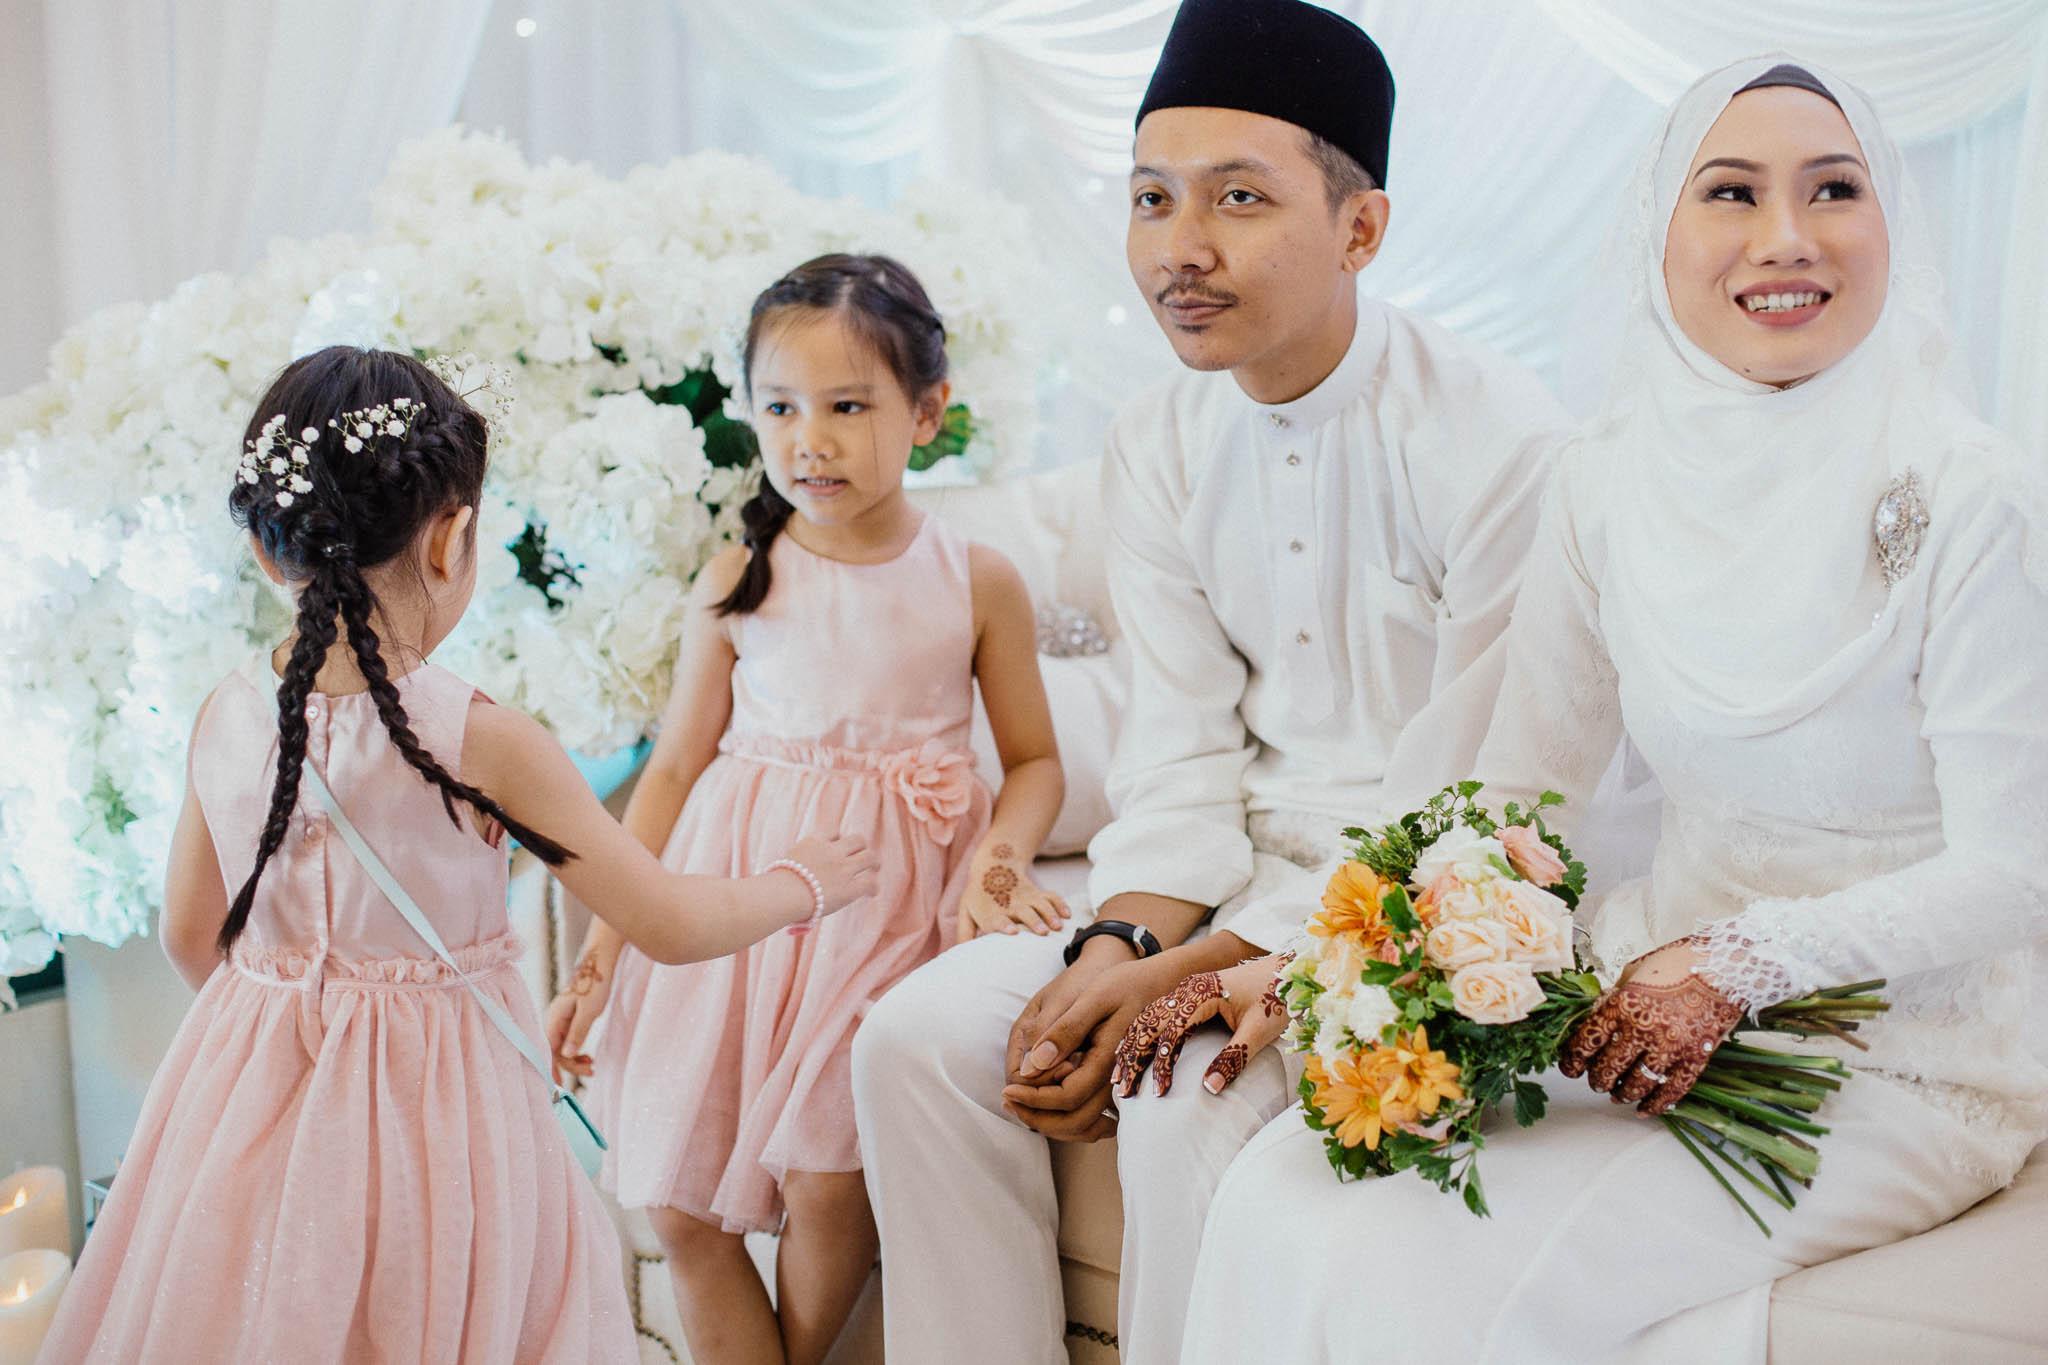 singapore-wedding-photographer-addafiq-nufail-032.jpg